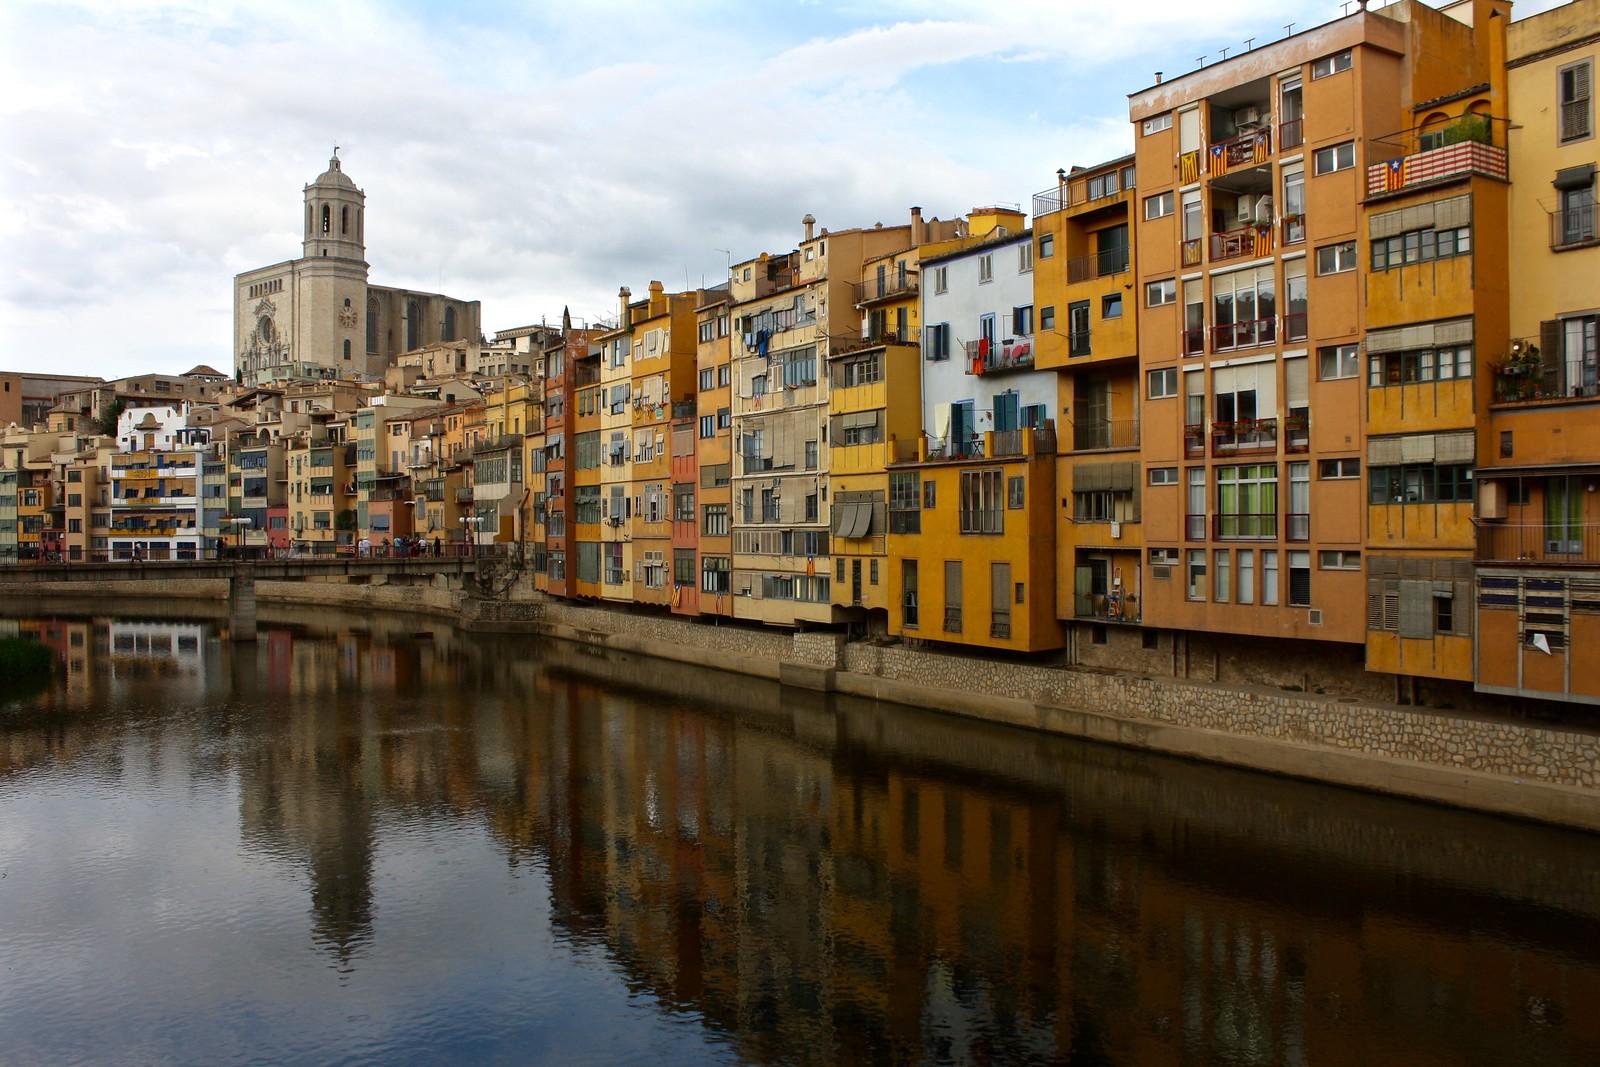 Onyar River in Girona